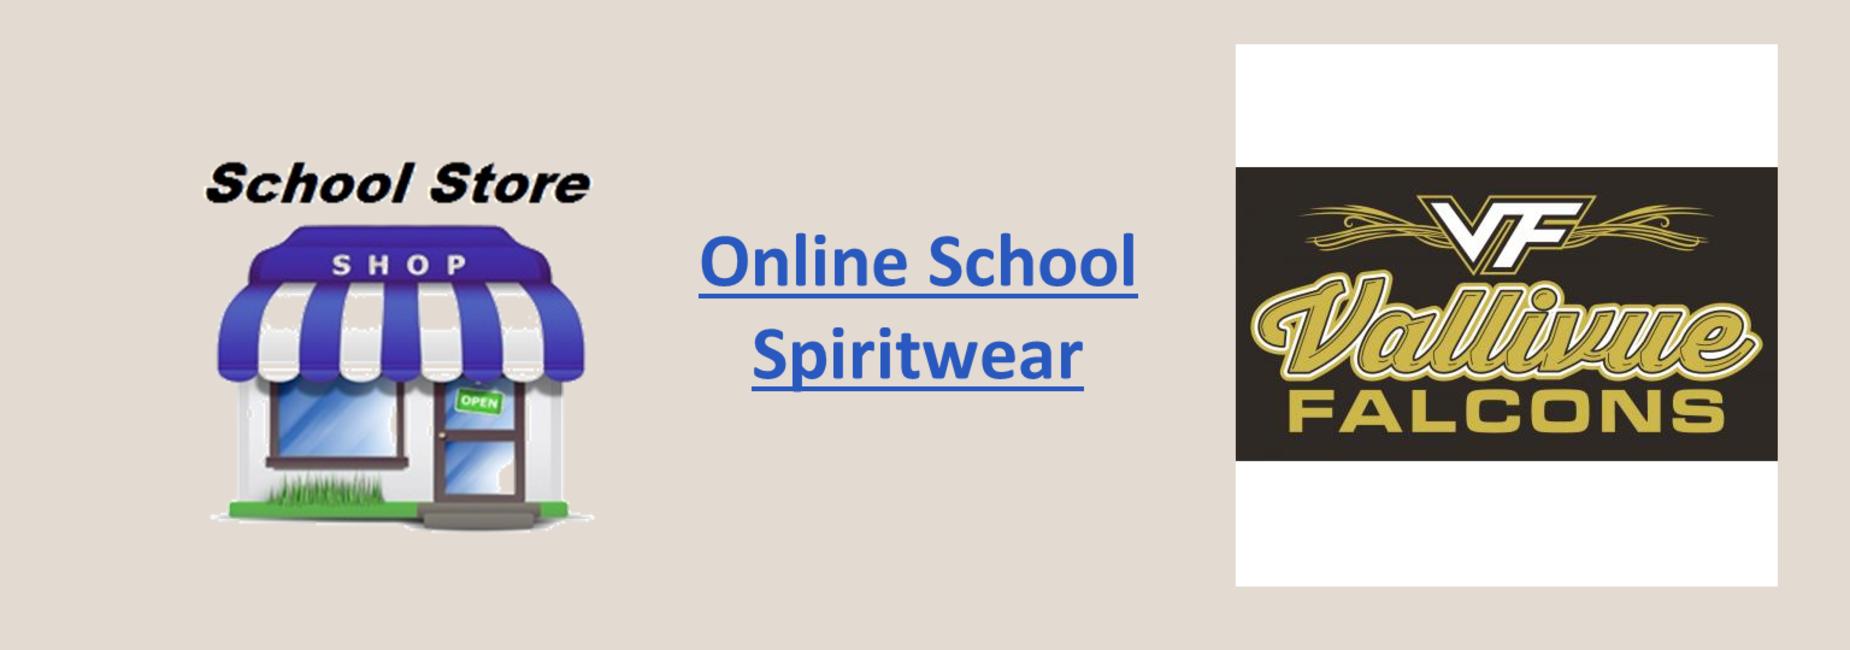 School Store-Spiritwear